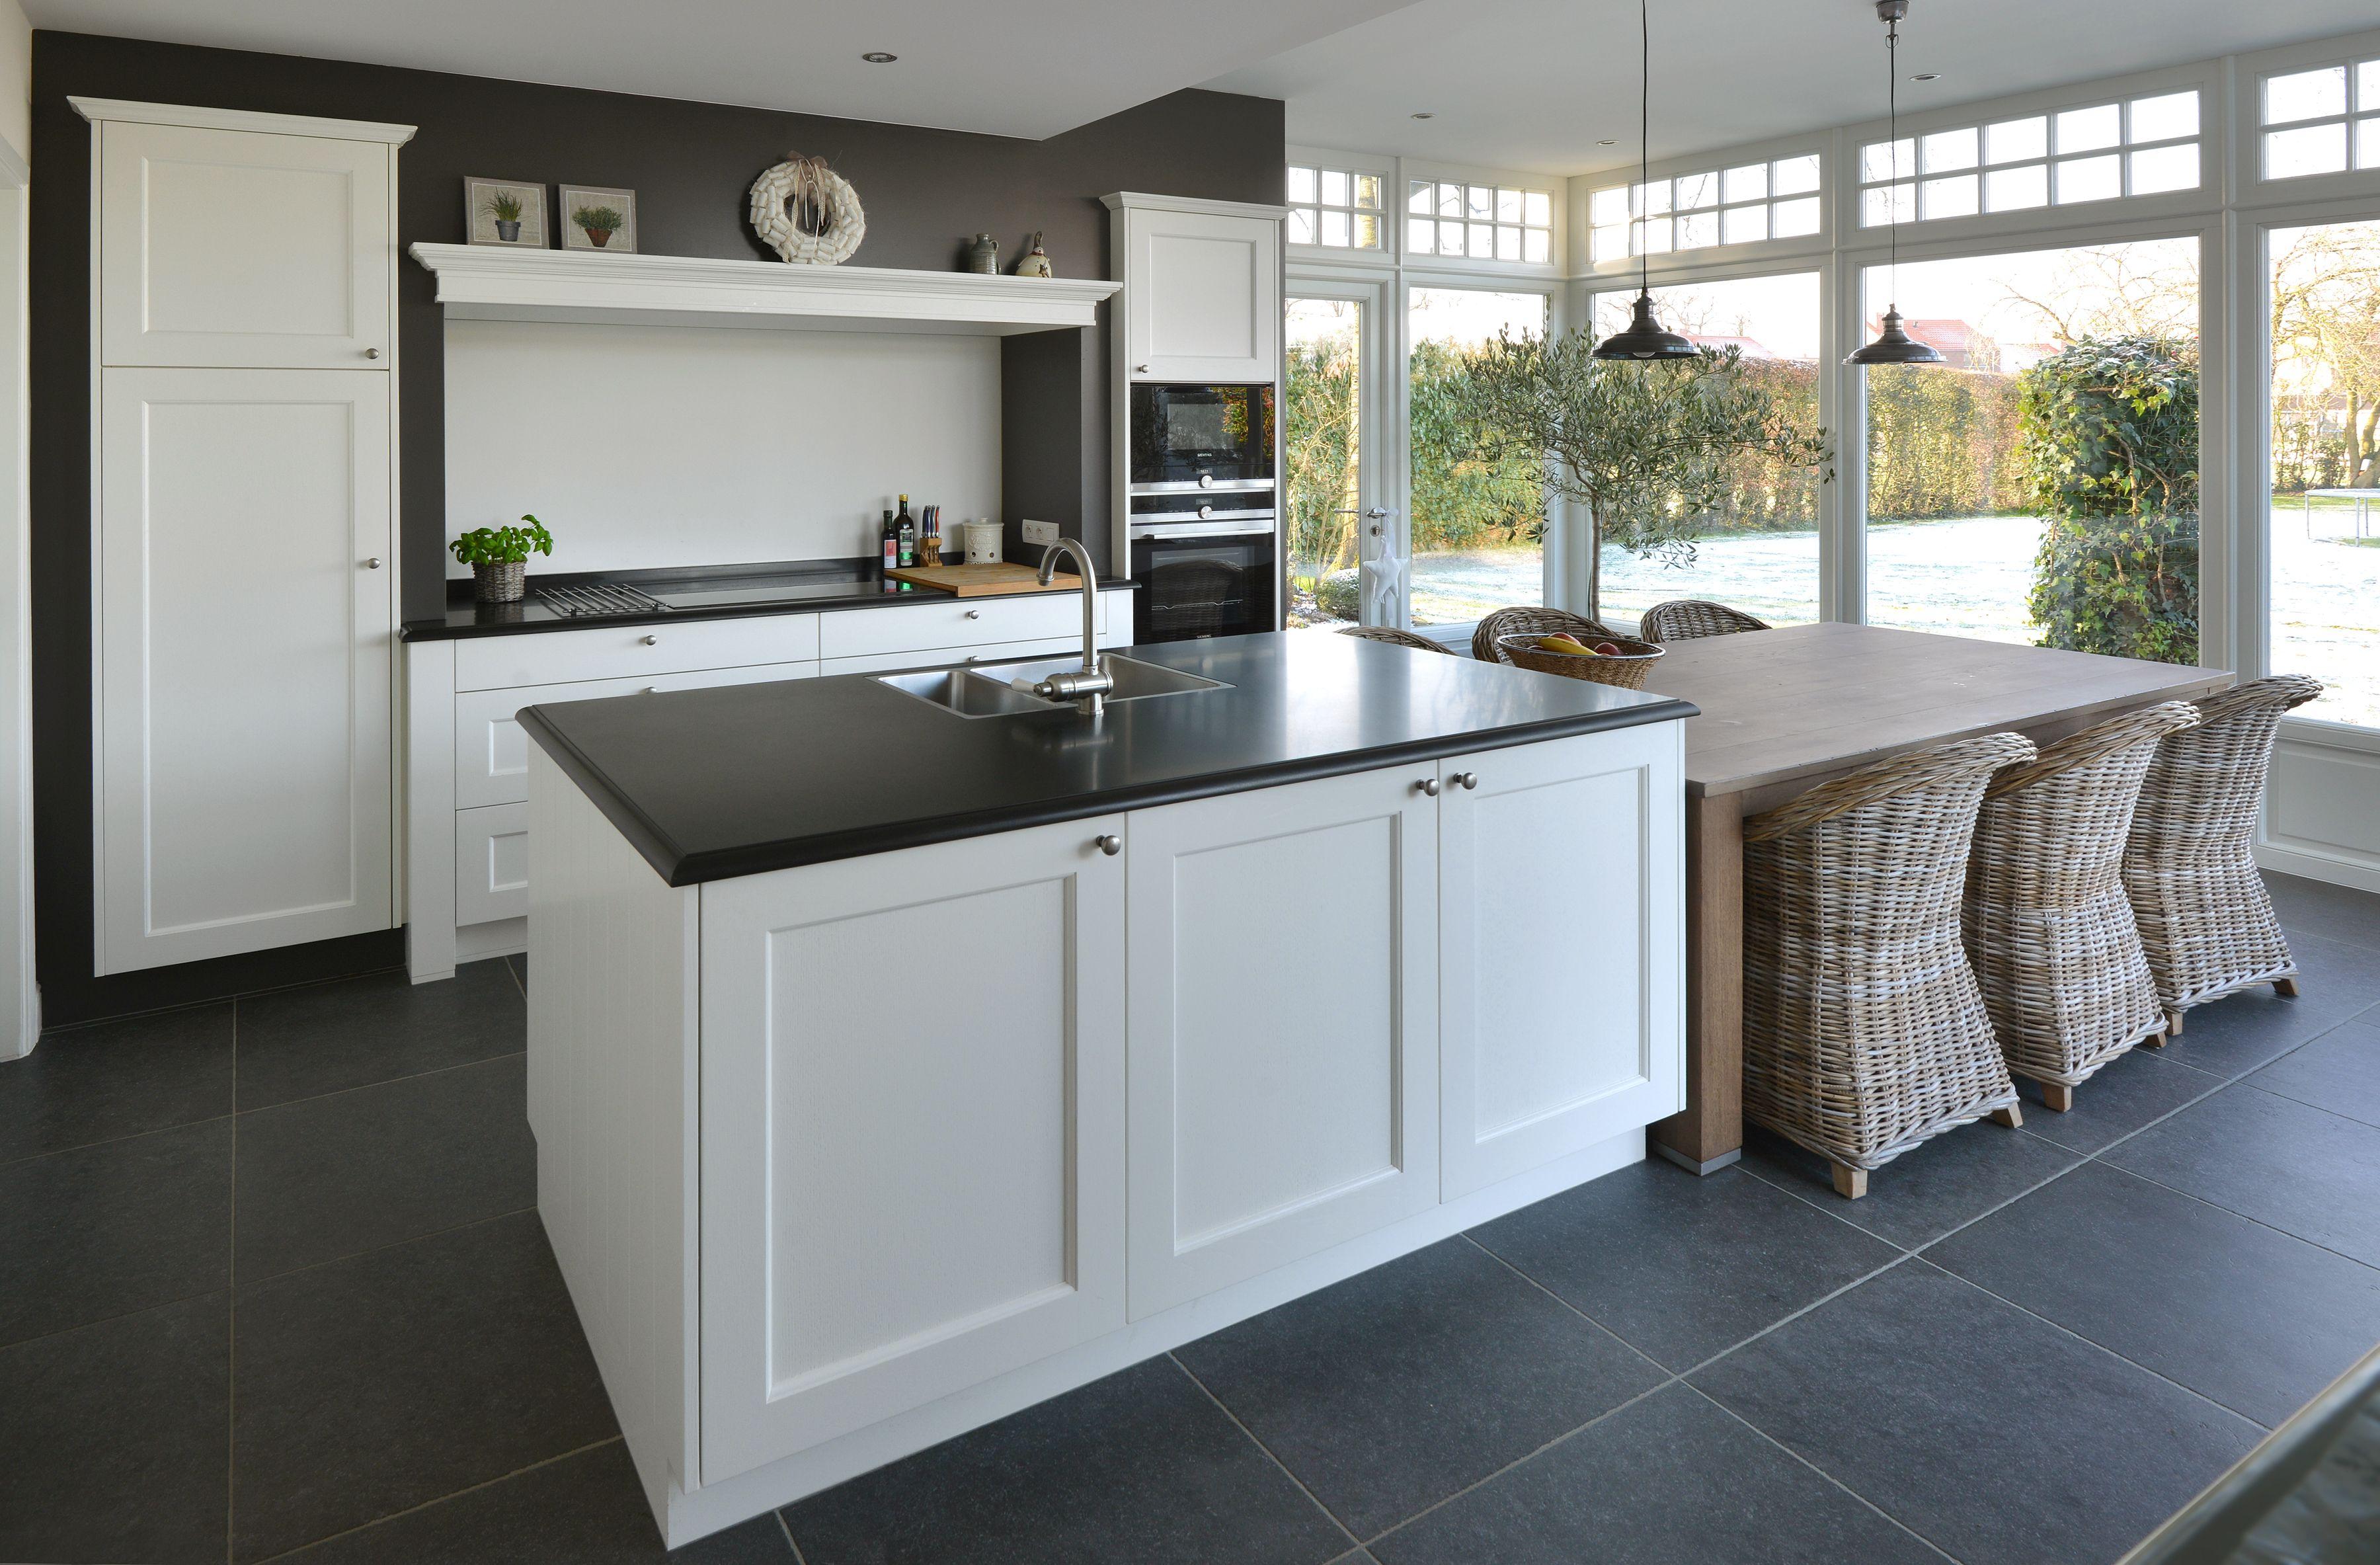 Groene kleur op de muur interieur meubilair idee n - Meubilair zwarte keuken lak ...